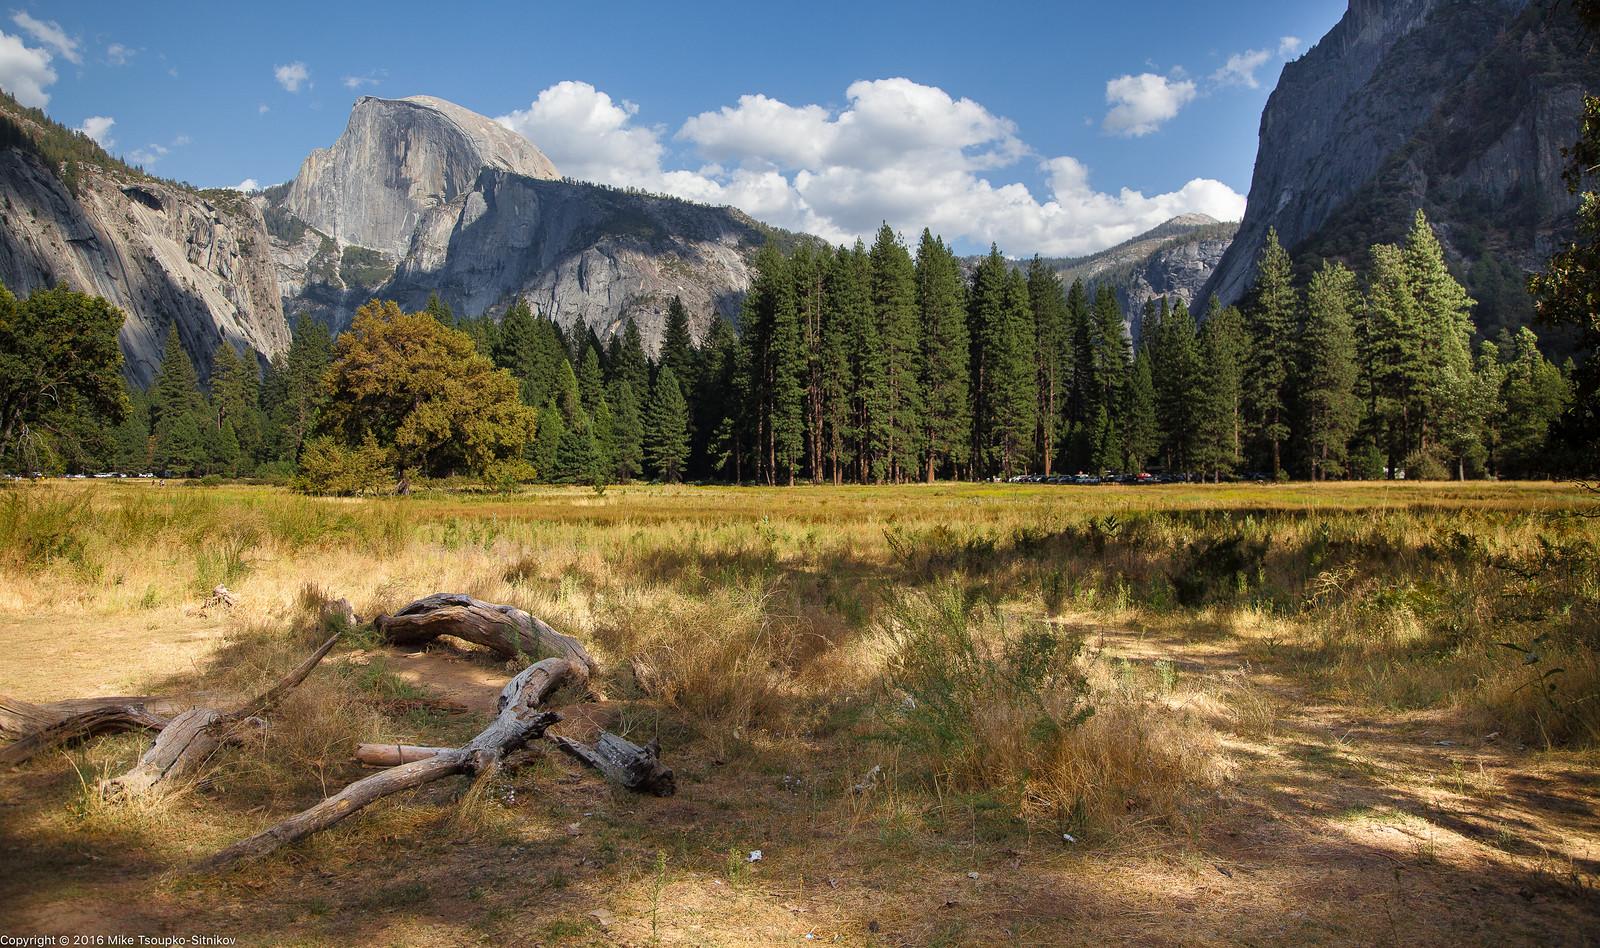 Yosemite Valley in August